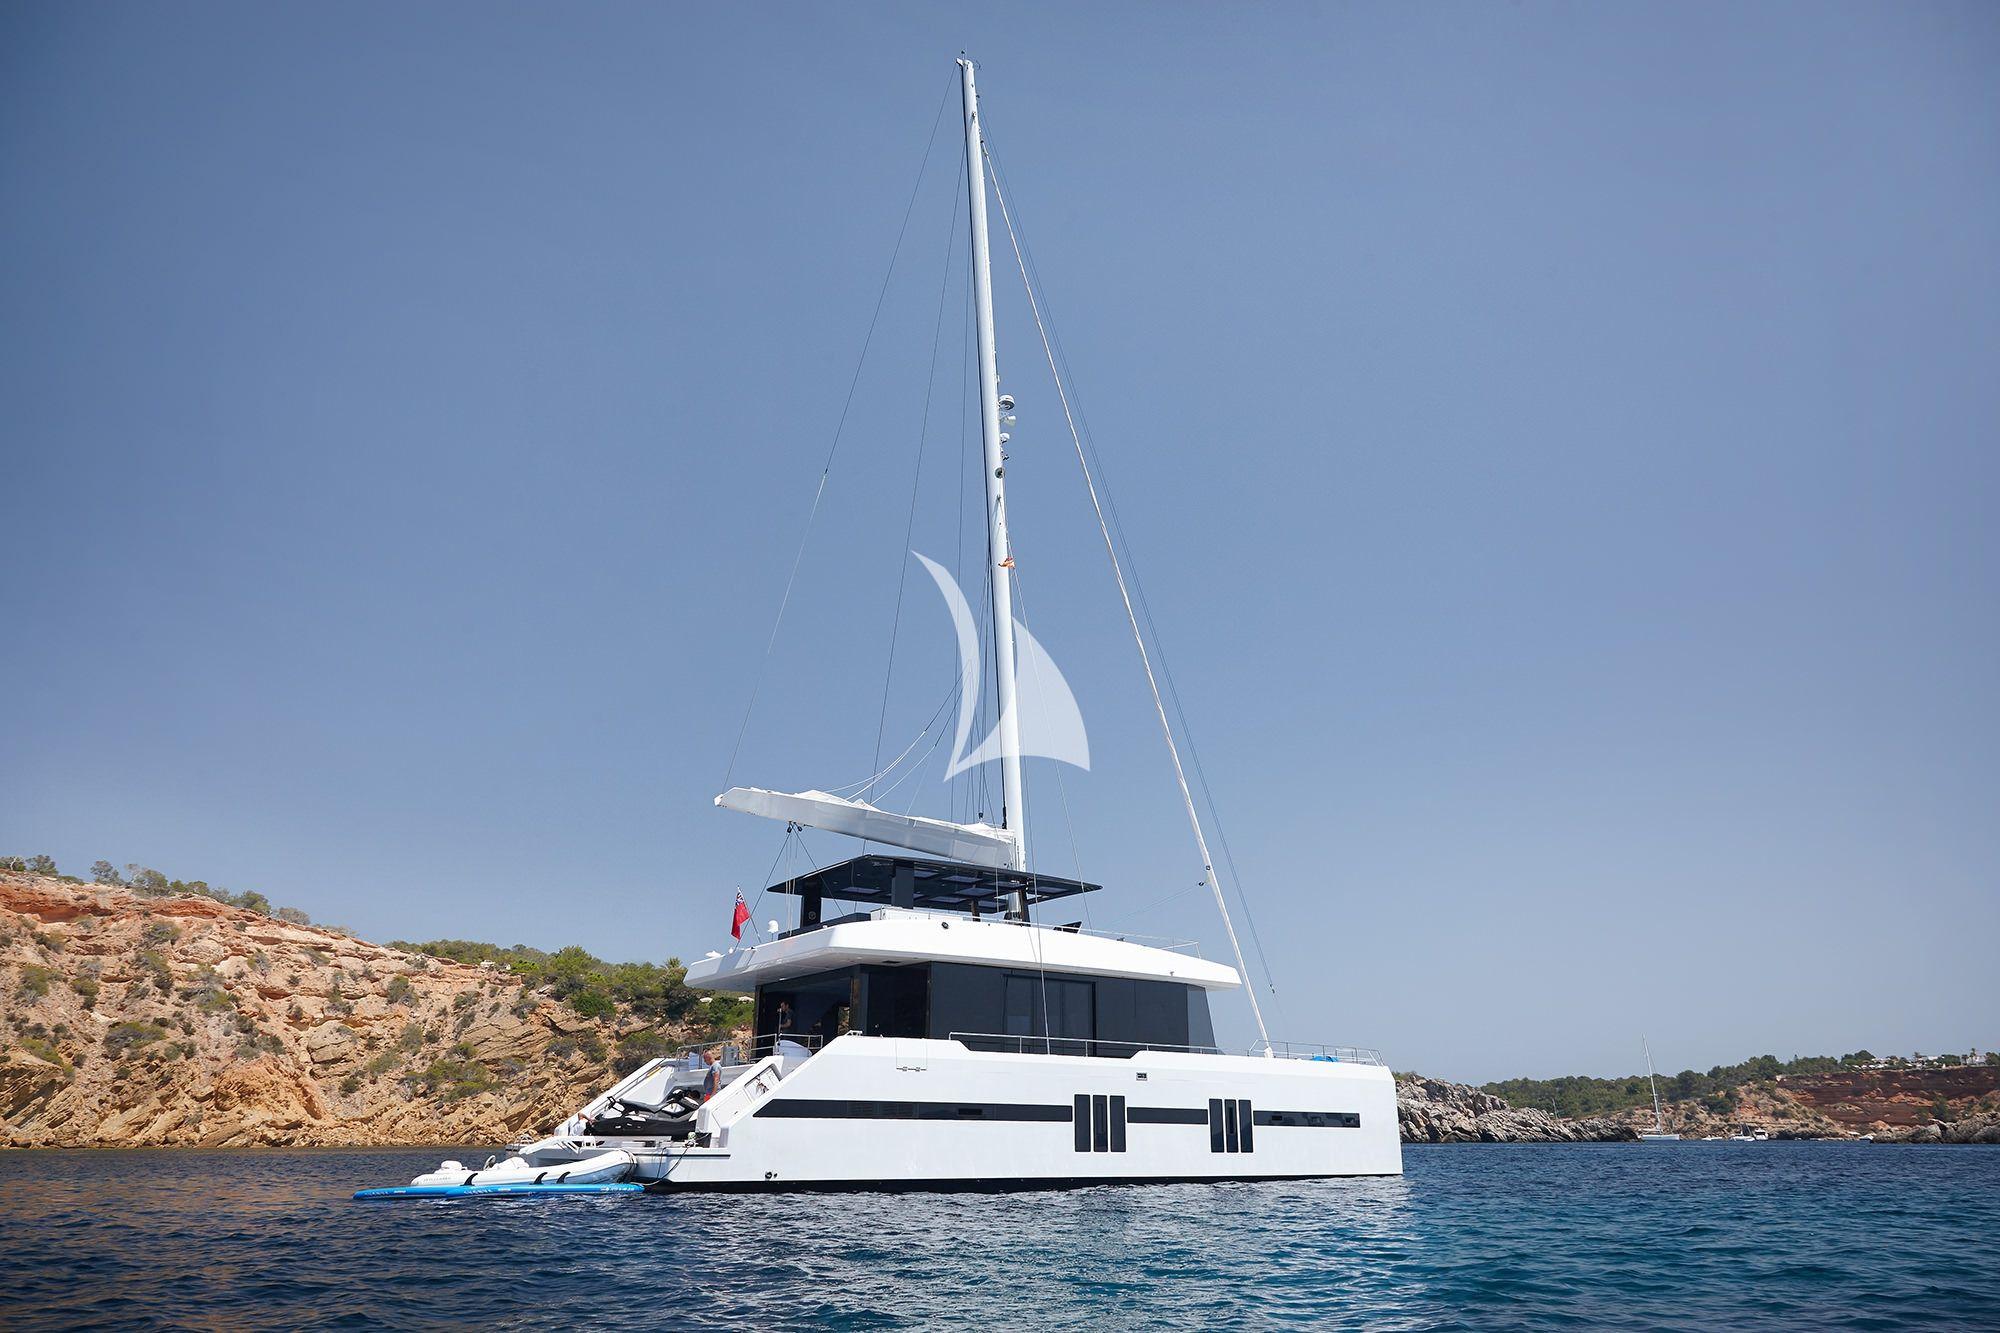 MIDORI - Sunreef Supreme 68 - Balearics - Ibiza - Palma